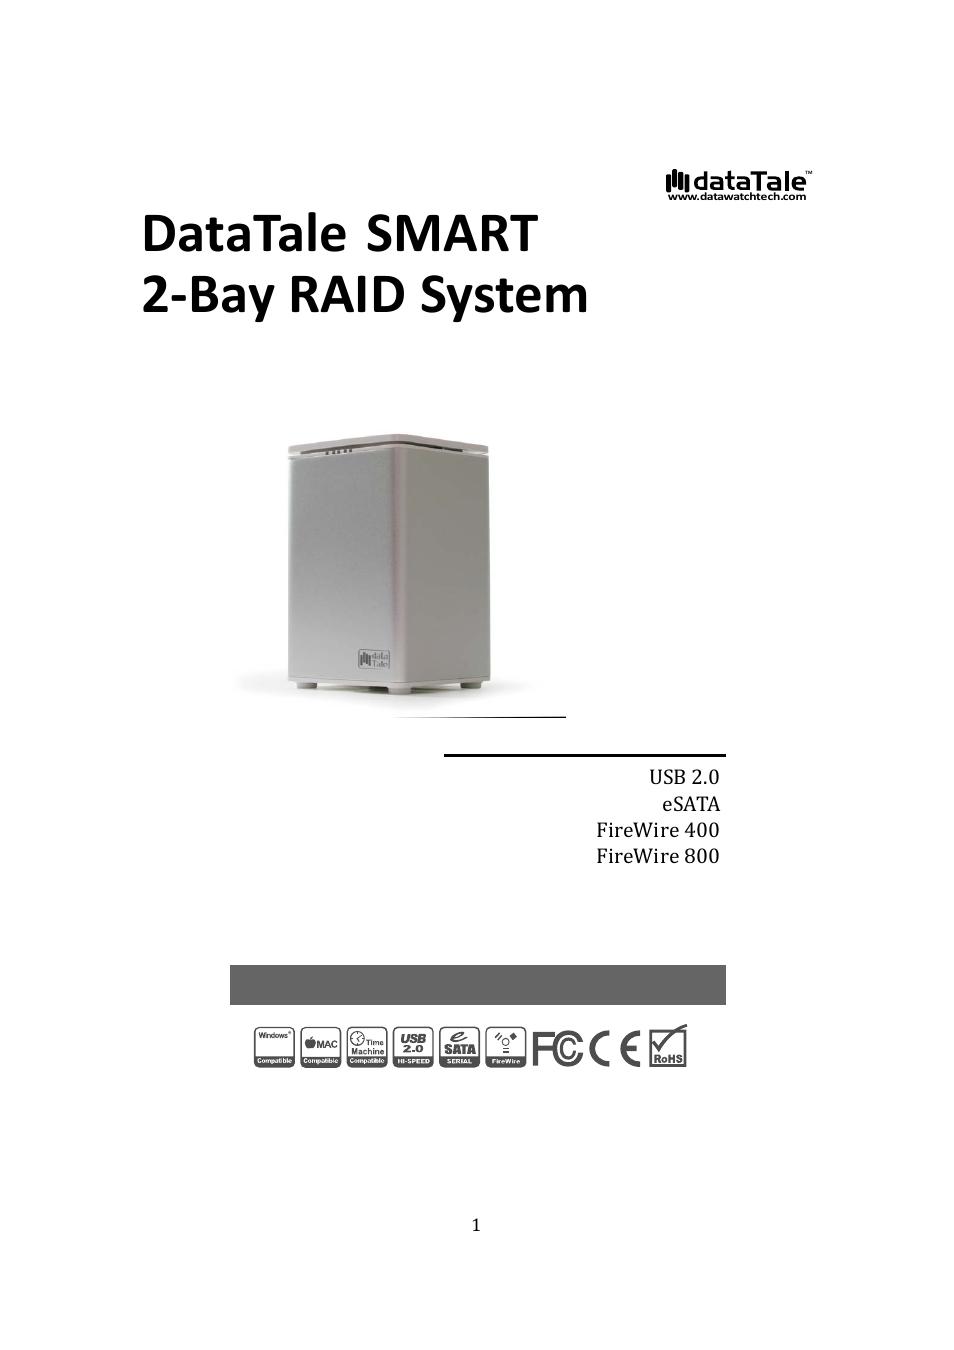 Oyen Digital Datatale Rs M2qj 2 Bay Raid User Manual 47 Pages Firewire Diagram